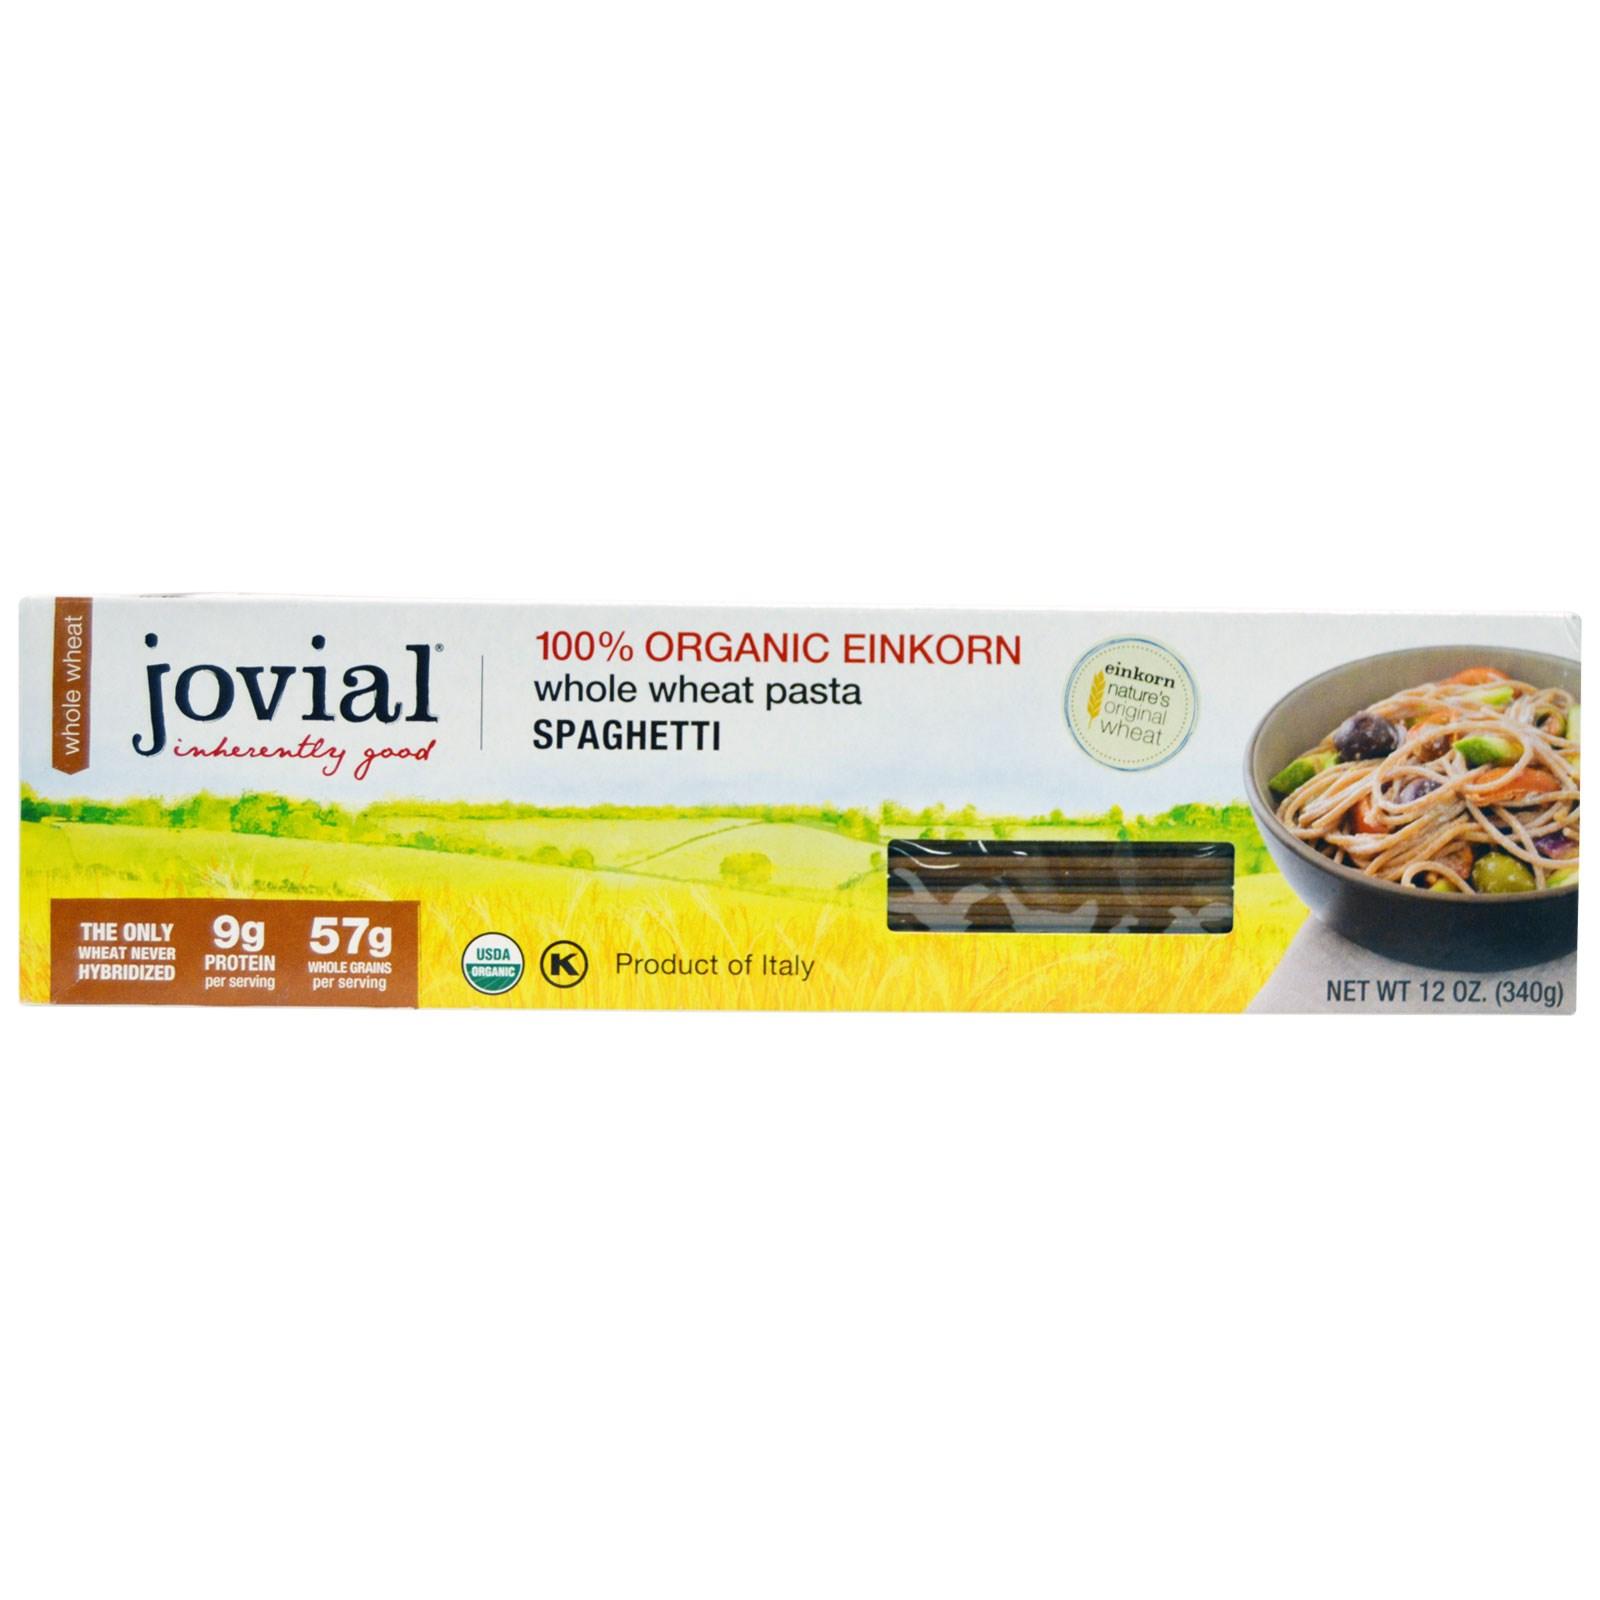 Jovial, Whole Wheat Pasta, Spaghetti, 12 oz(pack of 12)